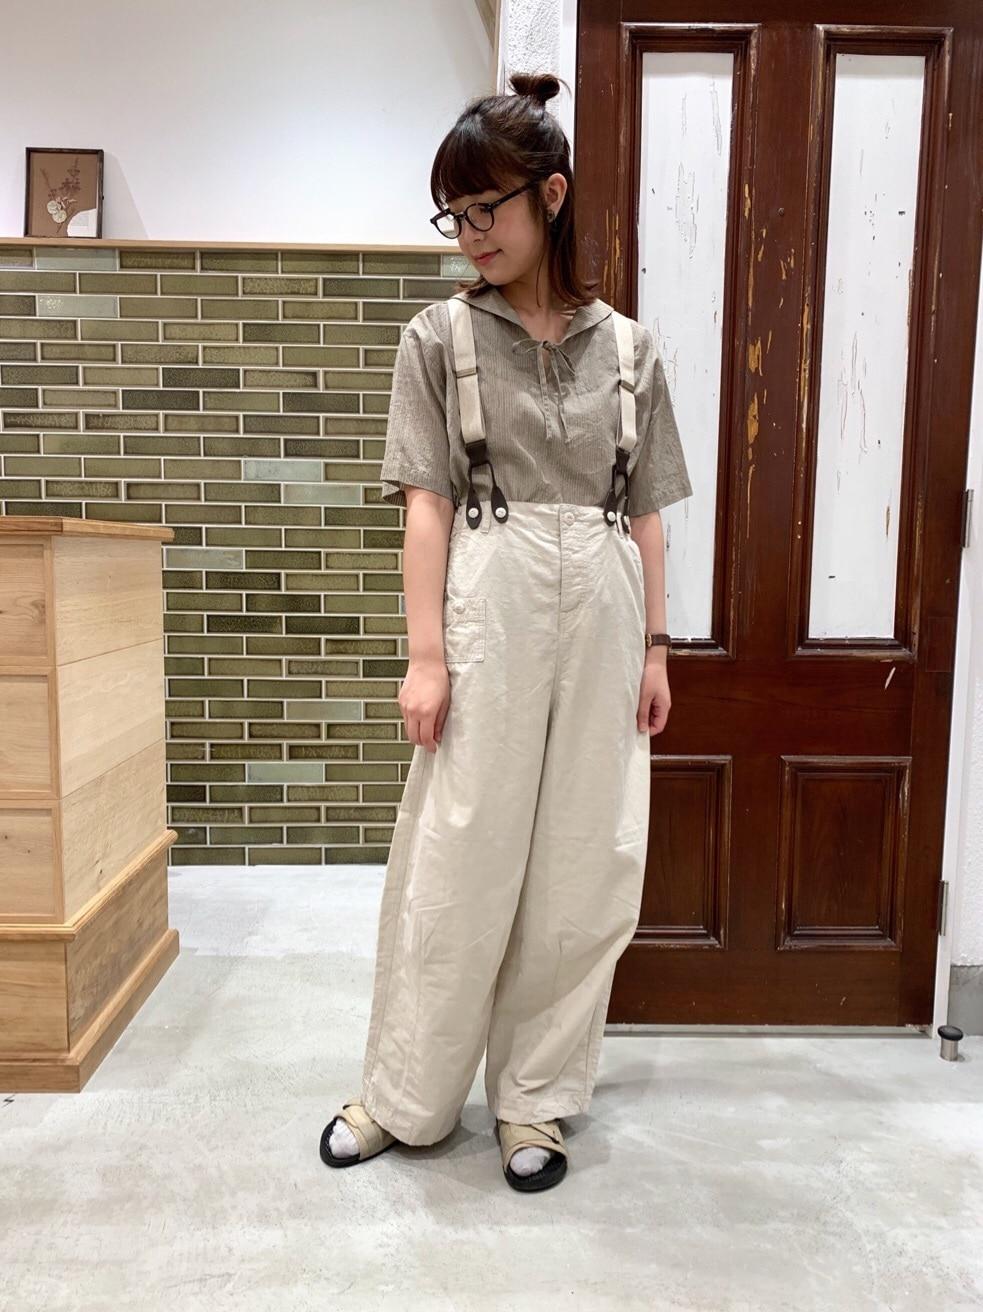 chambre de charme 横浜ジョイナス 身長:162cm 2020.06.23